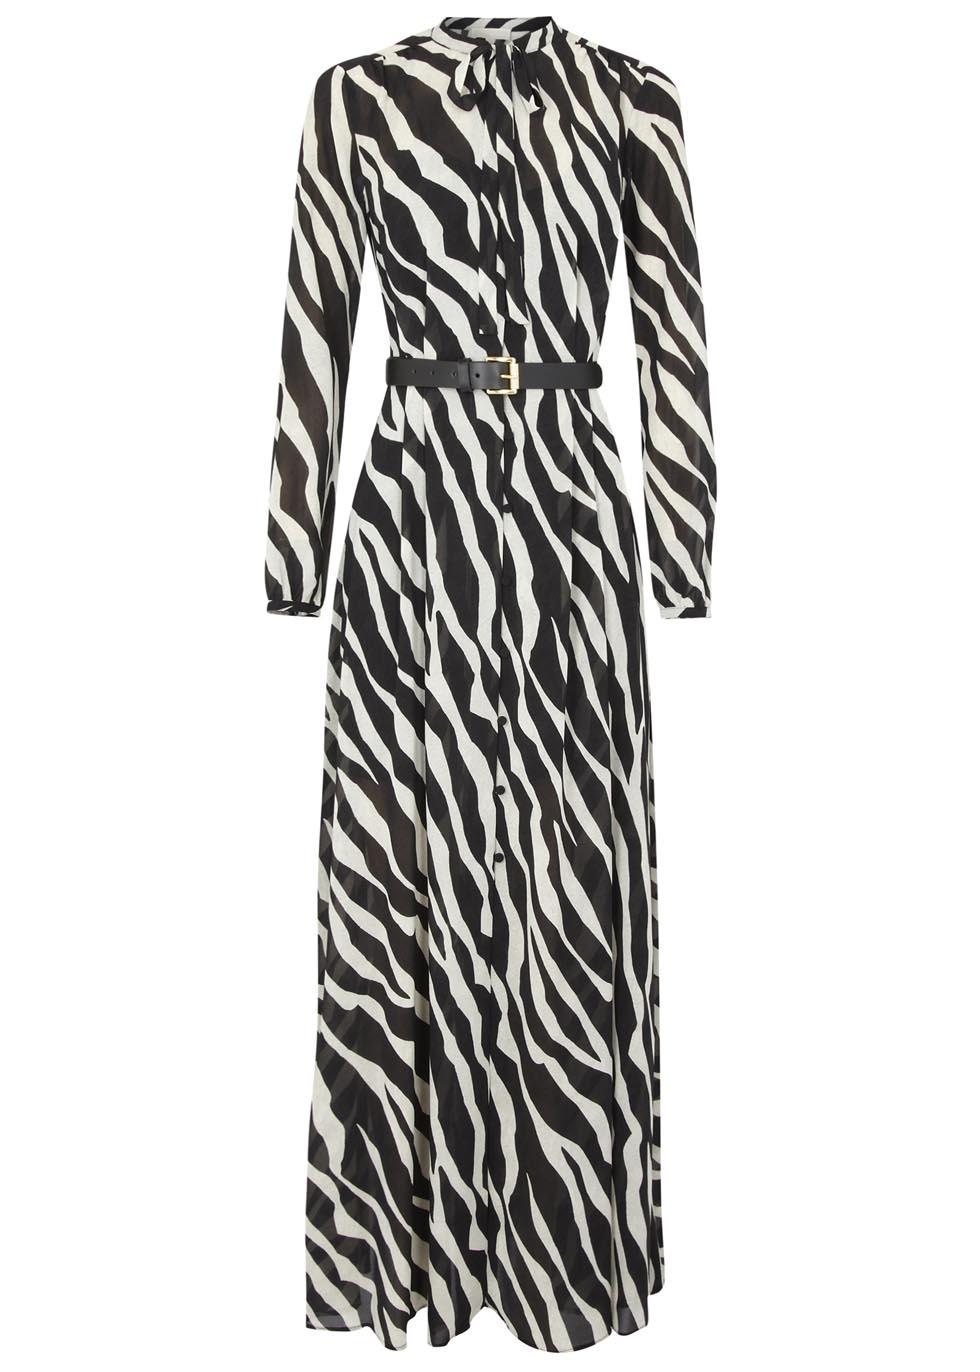 2019 year lifestyle- Print zebra maxi dresses